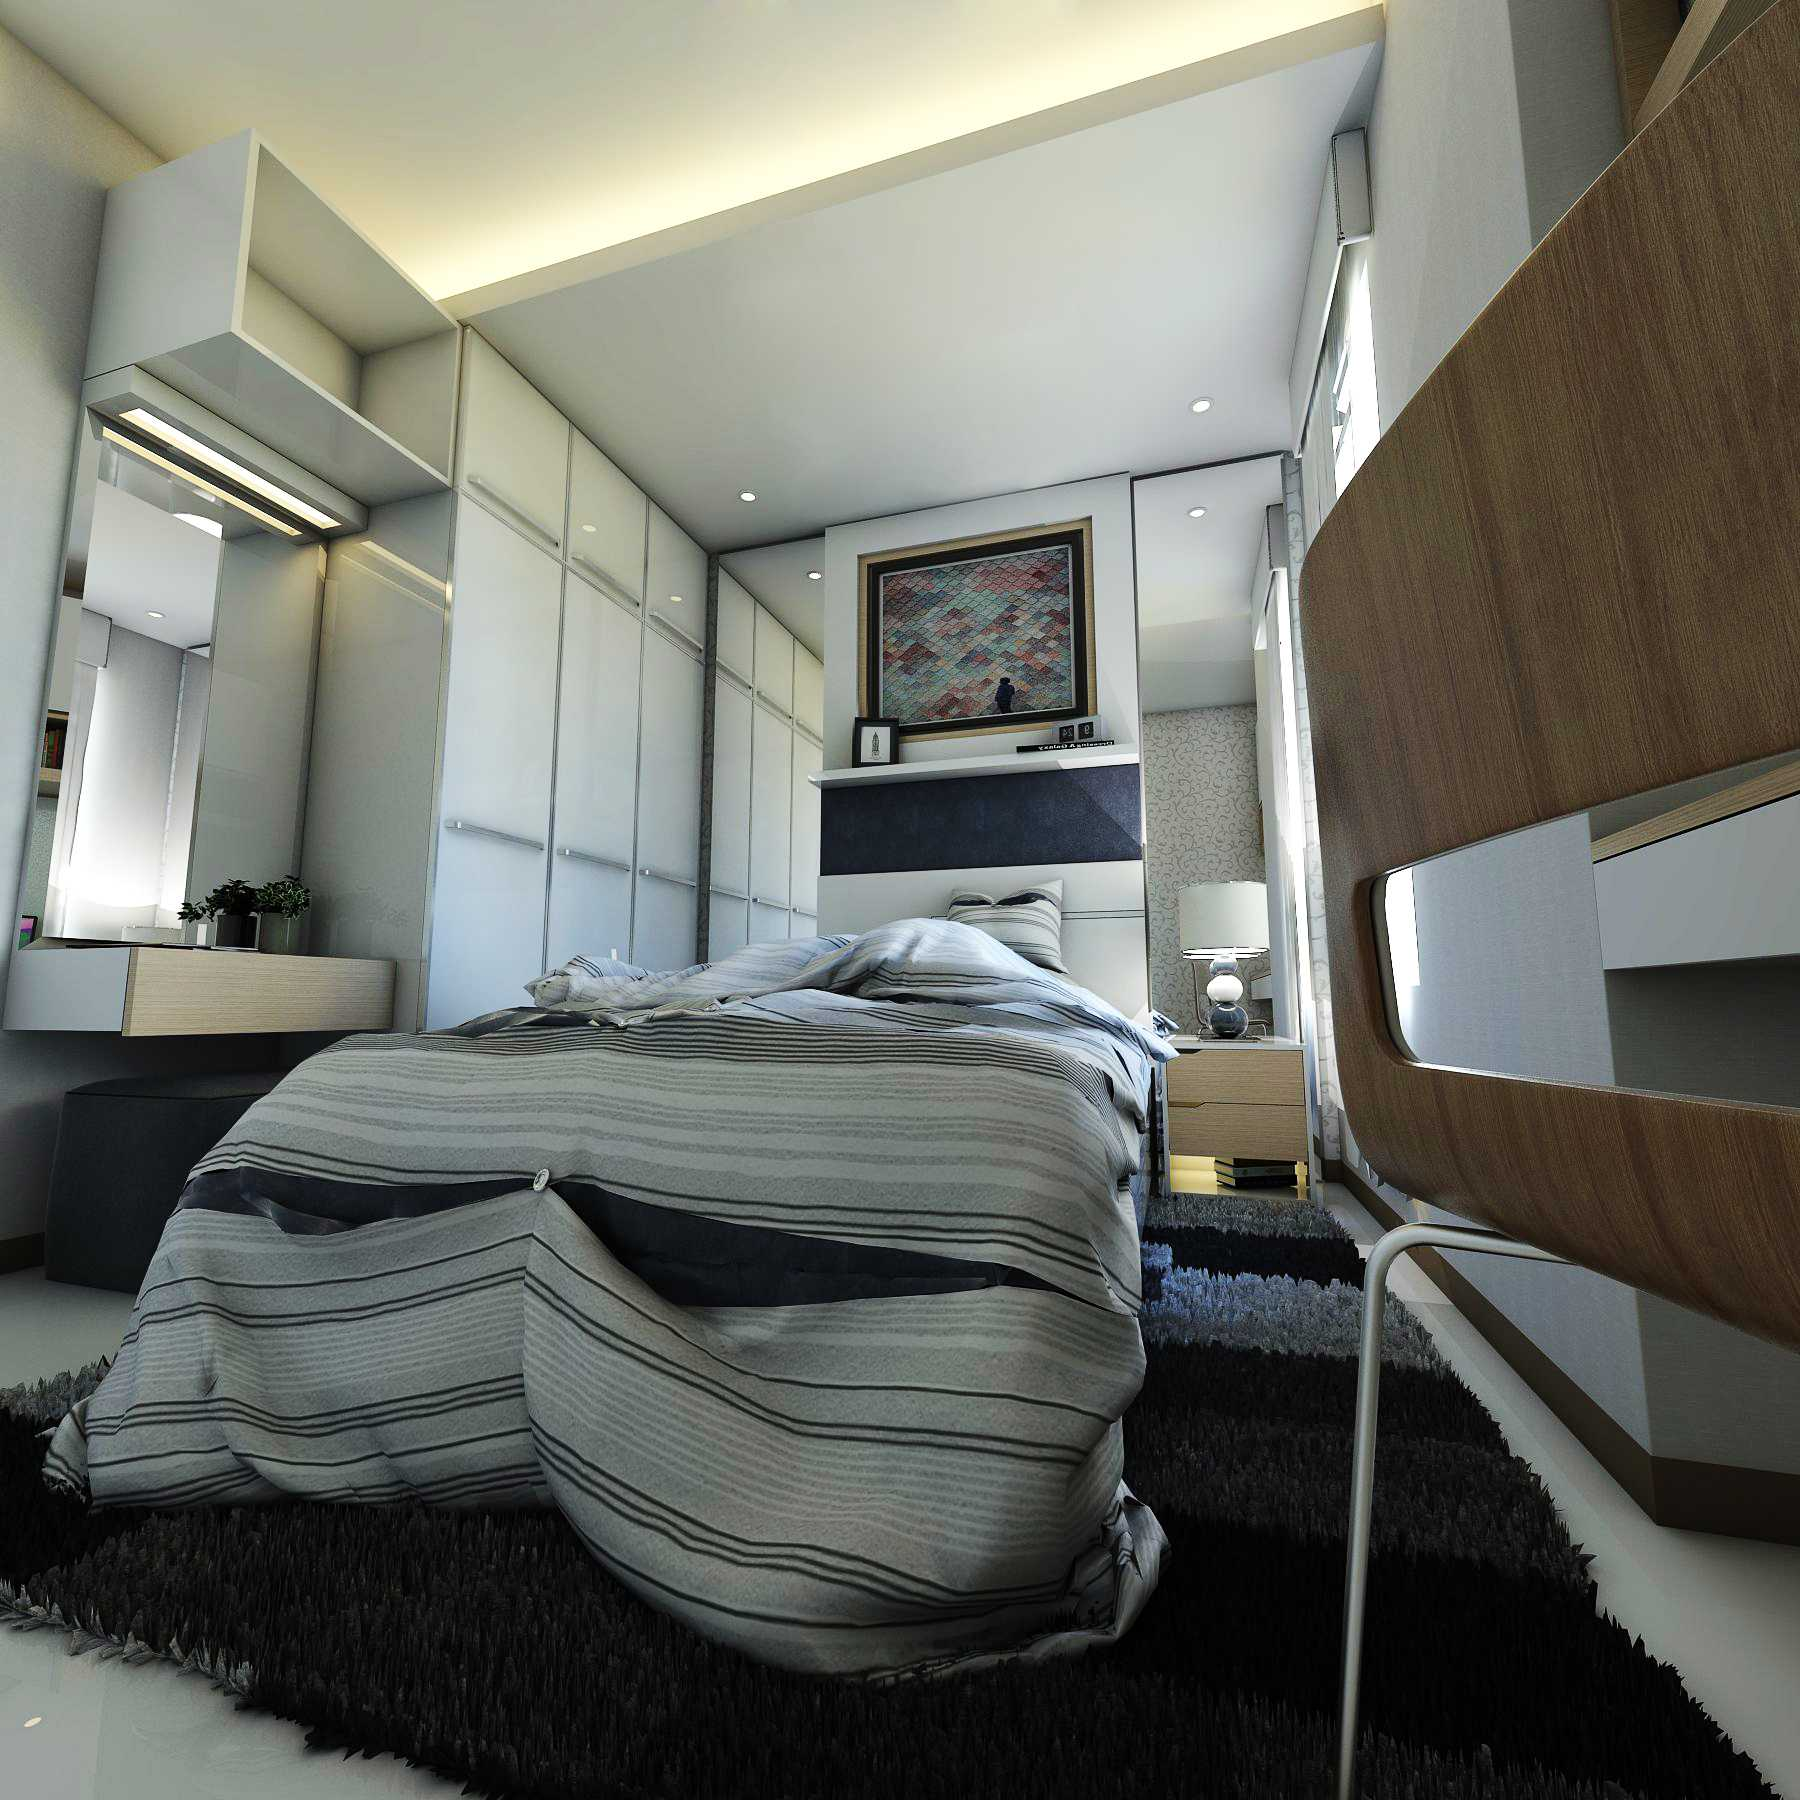 Maxx Details Interior Padasuka Ideal Resident Kota Bandung, Jawa Barat, Indonesia Kota Bandung, Jawa Barat, Indonesia Kids Bedroom  <P>Maxx Details</p> 48427